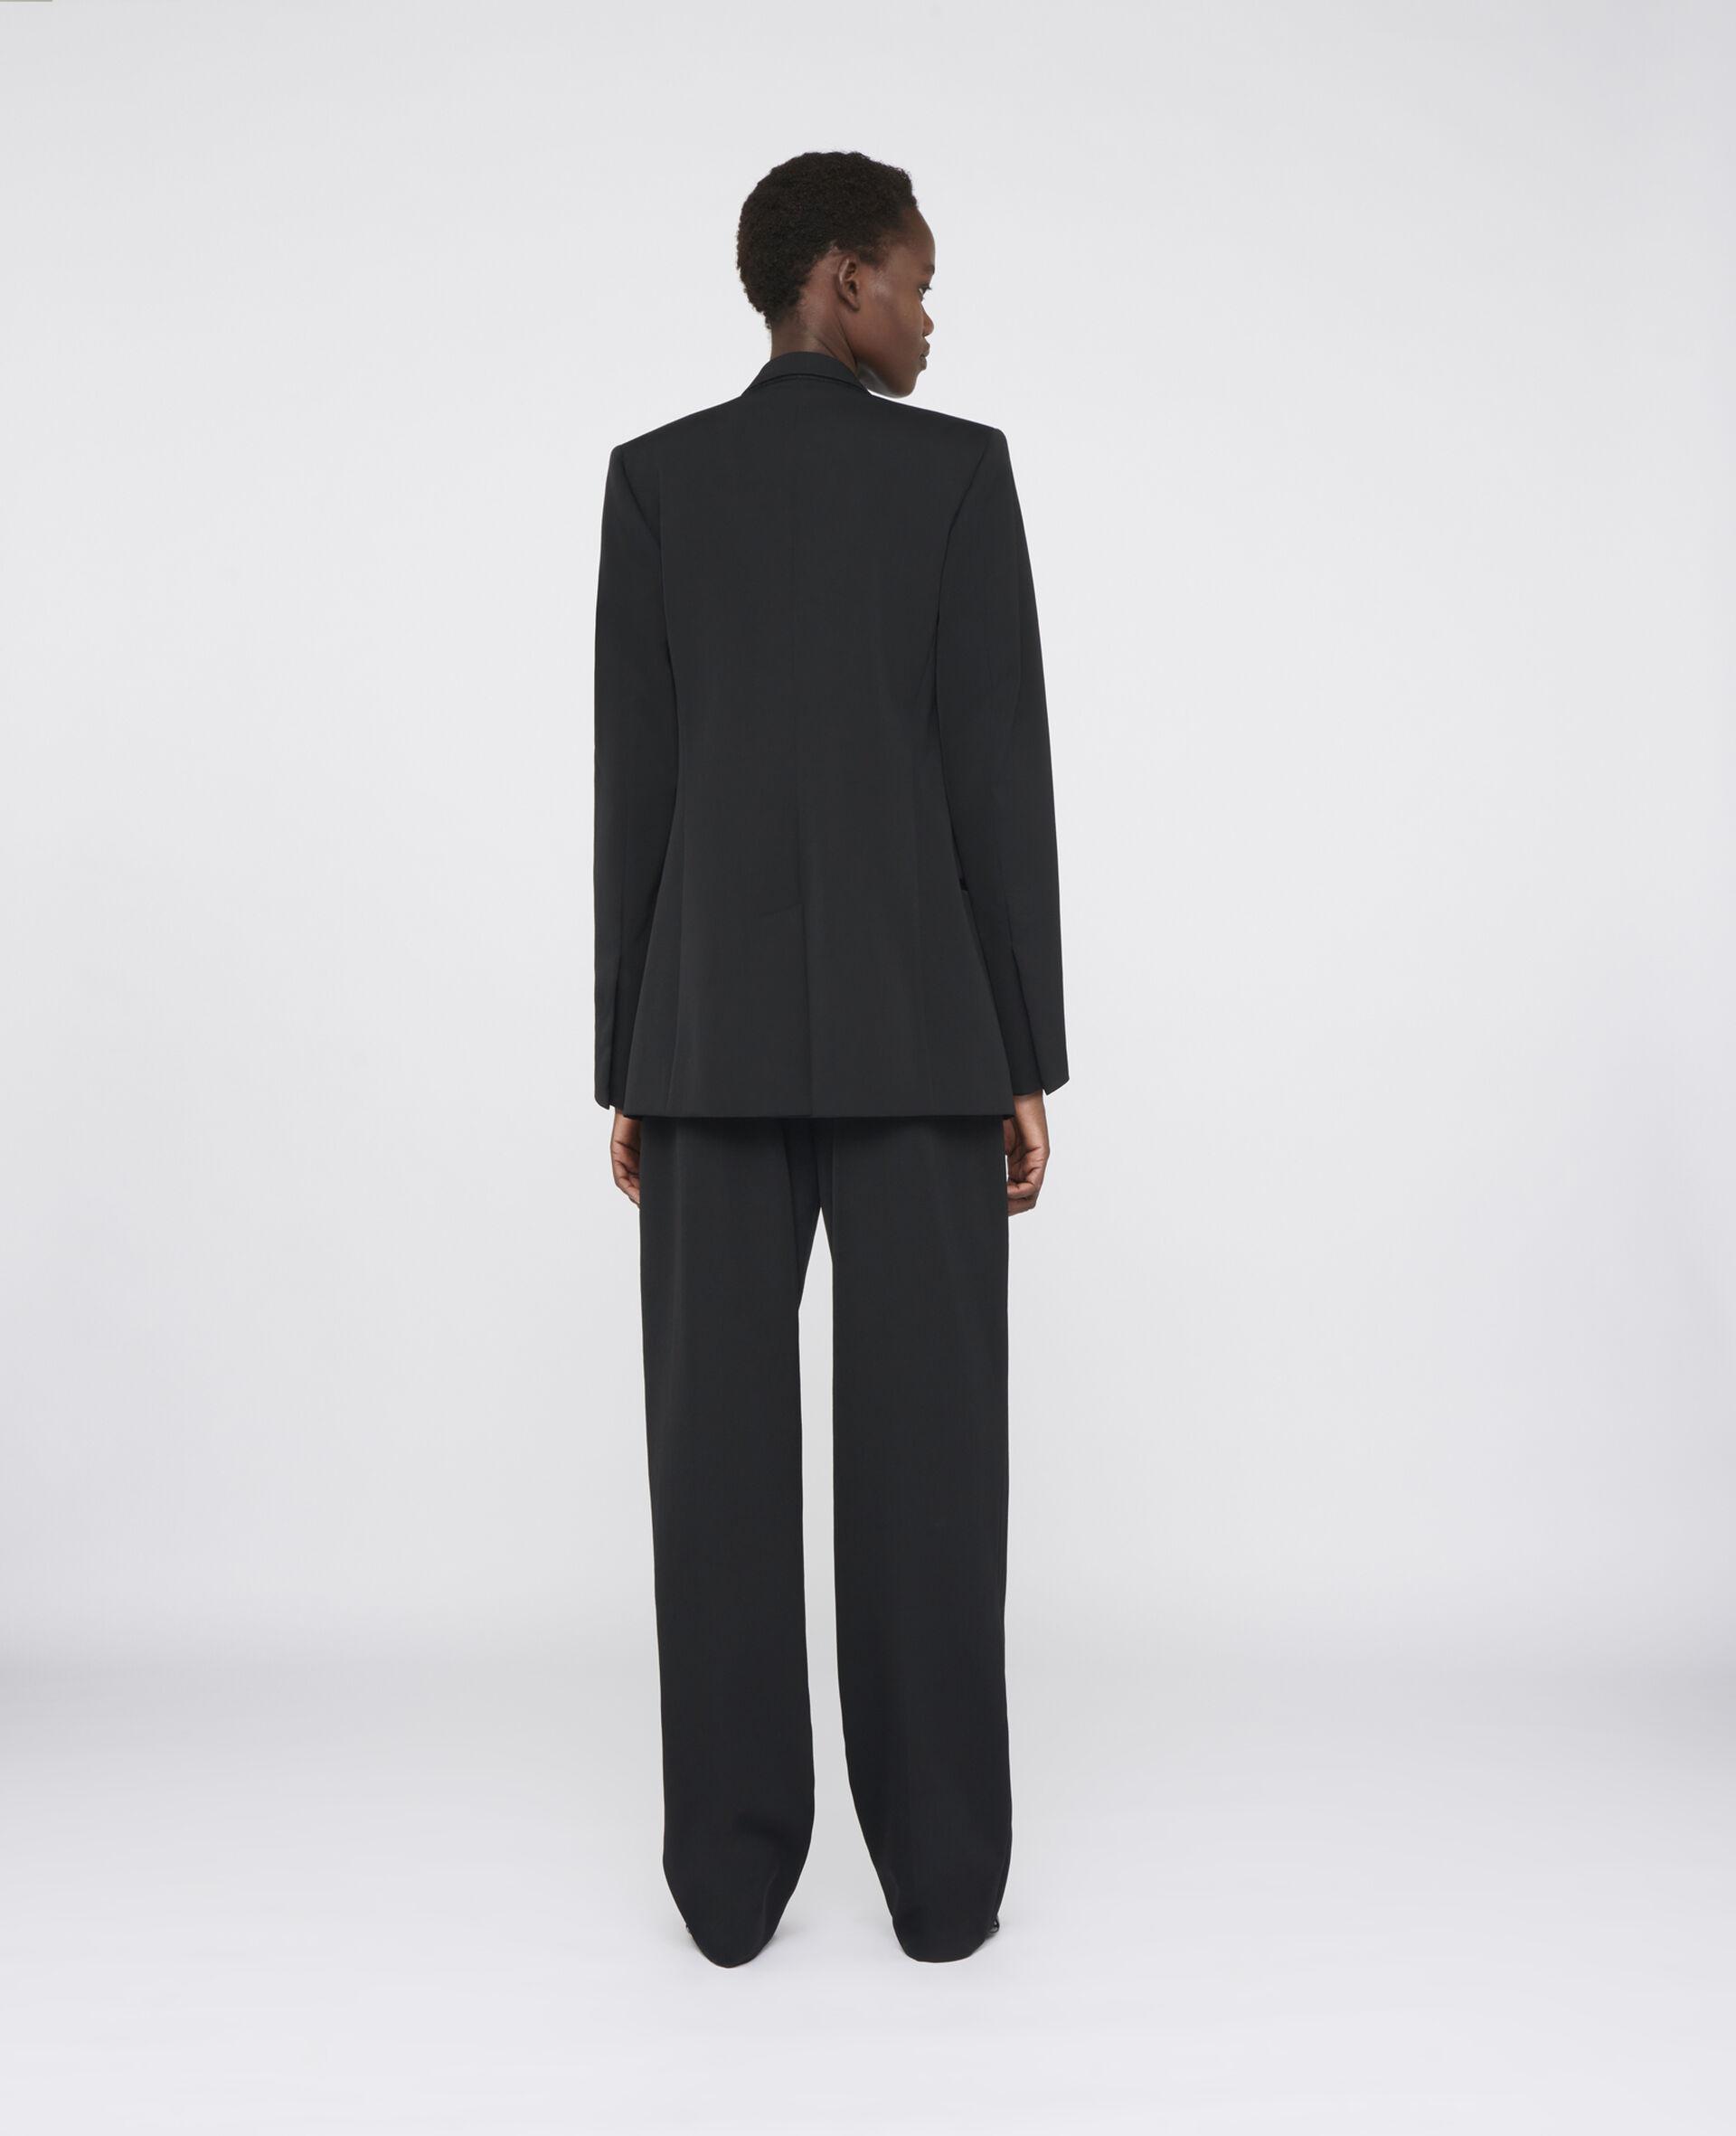 Couture-Jackett Delilah-Schwarz-large image number 2